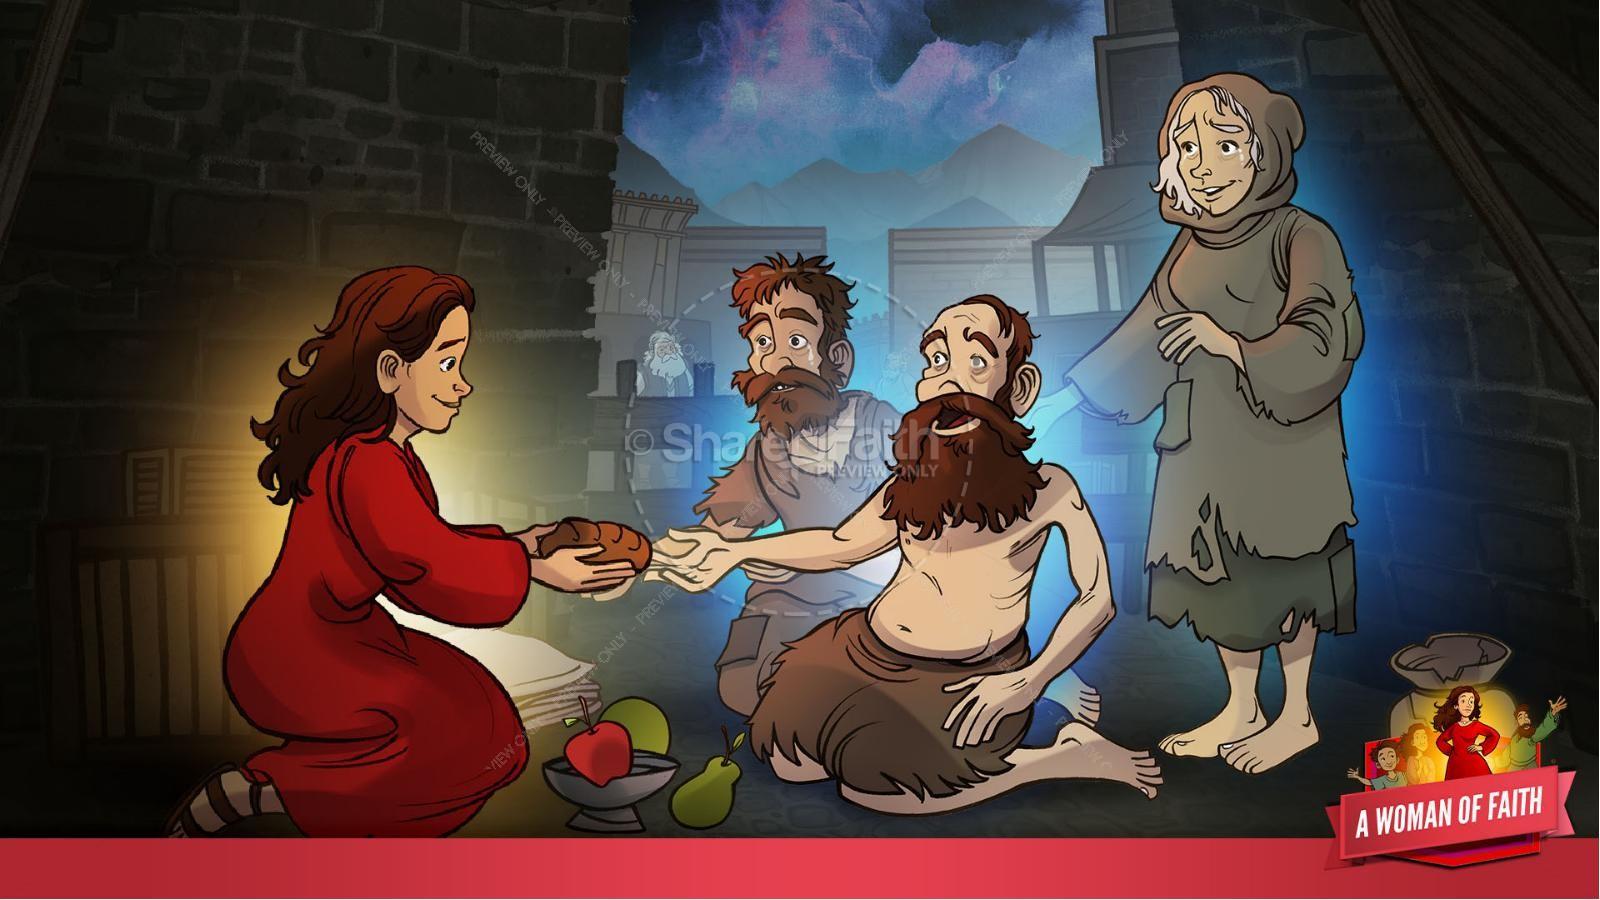 Proverbs 31 A Woman of Faith Kids Bible Story   slide 22